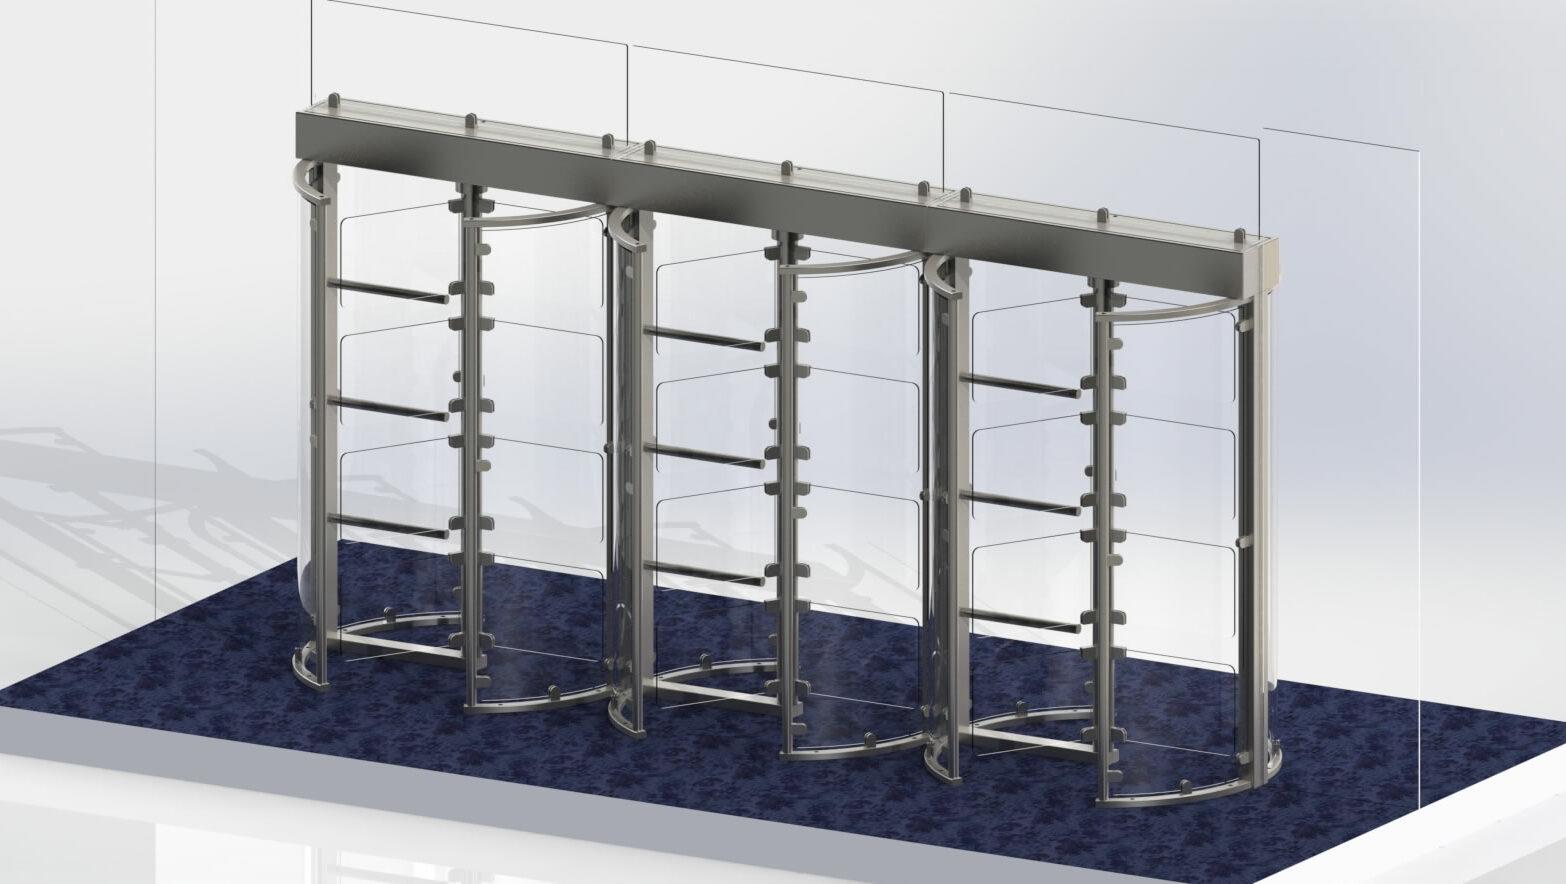 Full height stadium turnstiles with glass gates